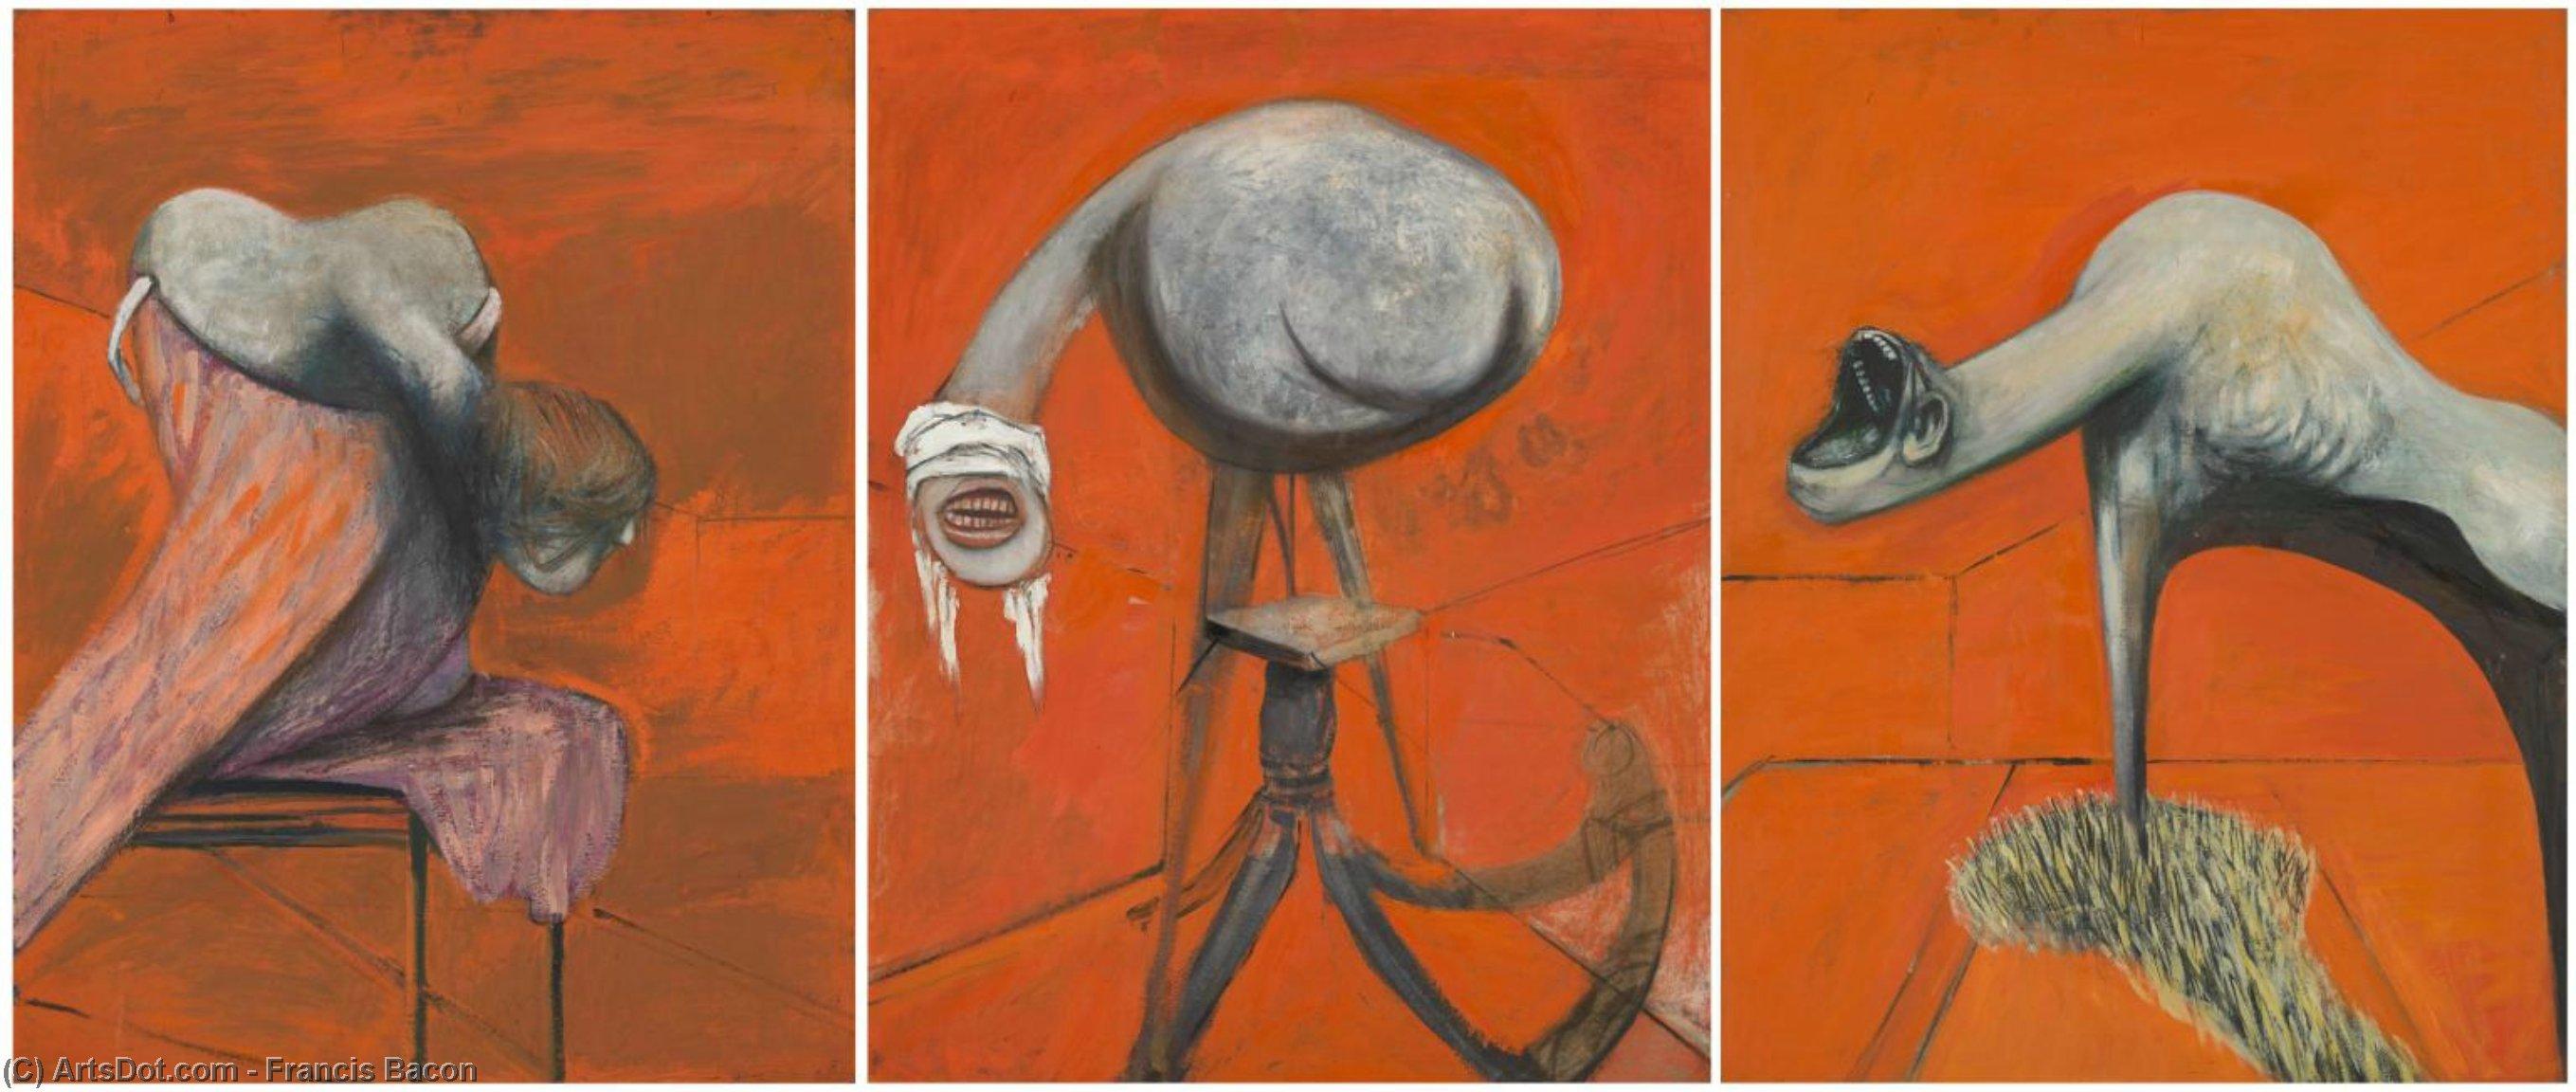 Wikoo.org - موسوعة الفنون الجميلة - اللوحة، العمل الفني Francis Bacon - Three Studies for Figures at the Base of a Crucifixion